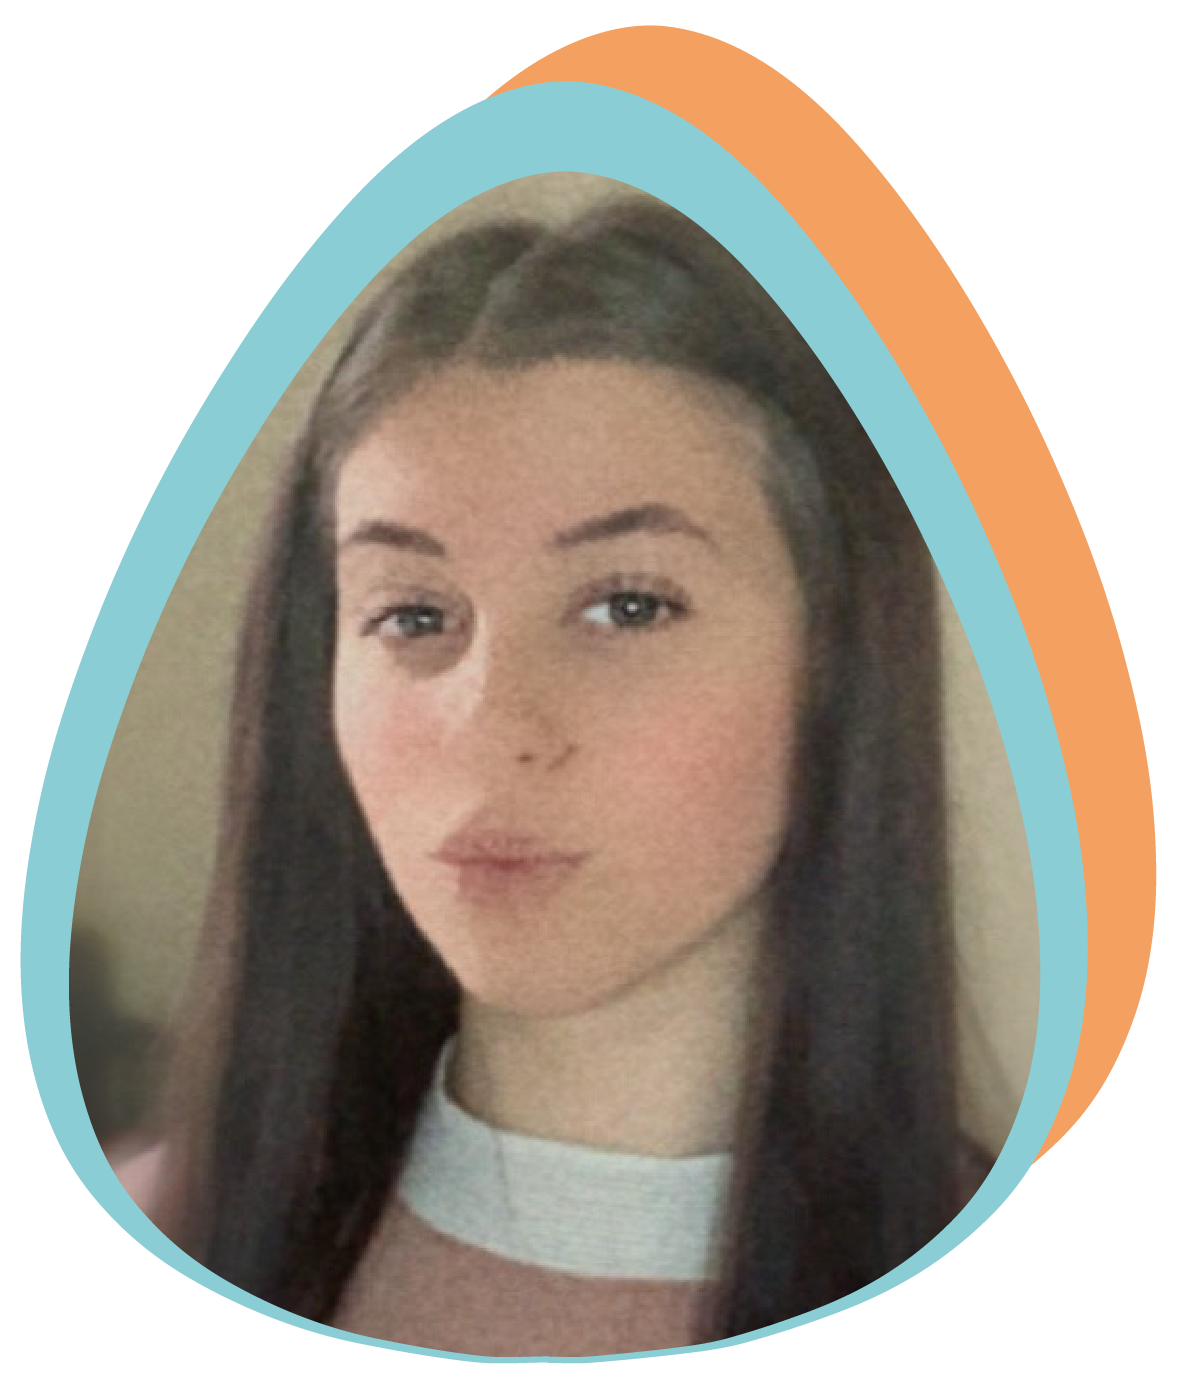 Aleisha Whenlock